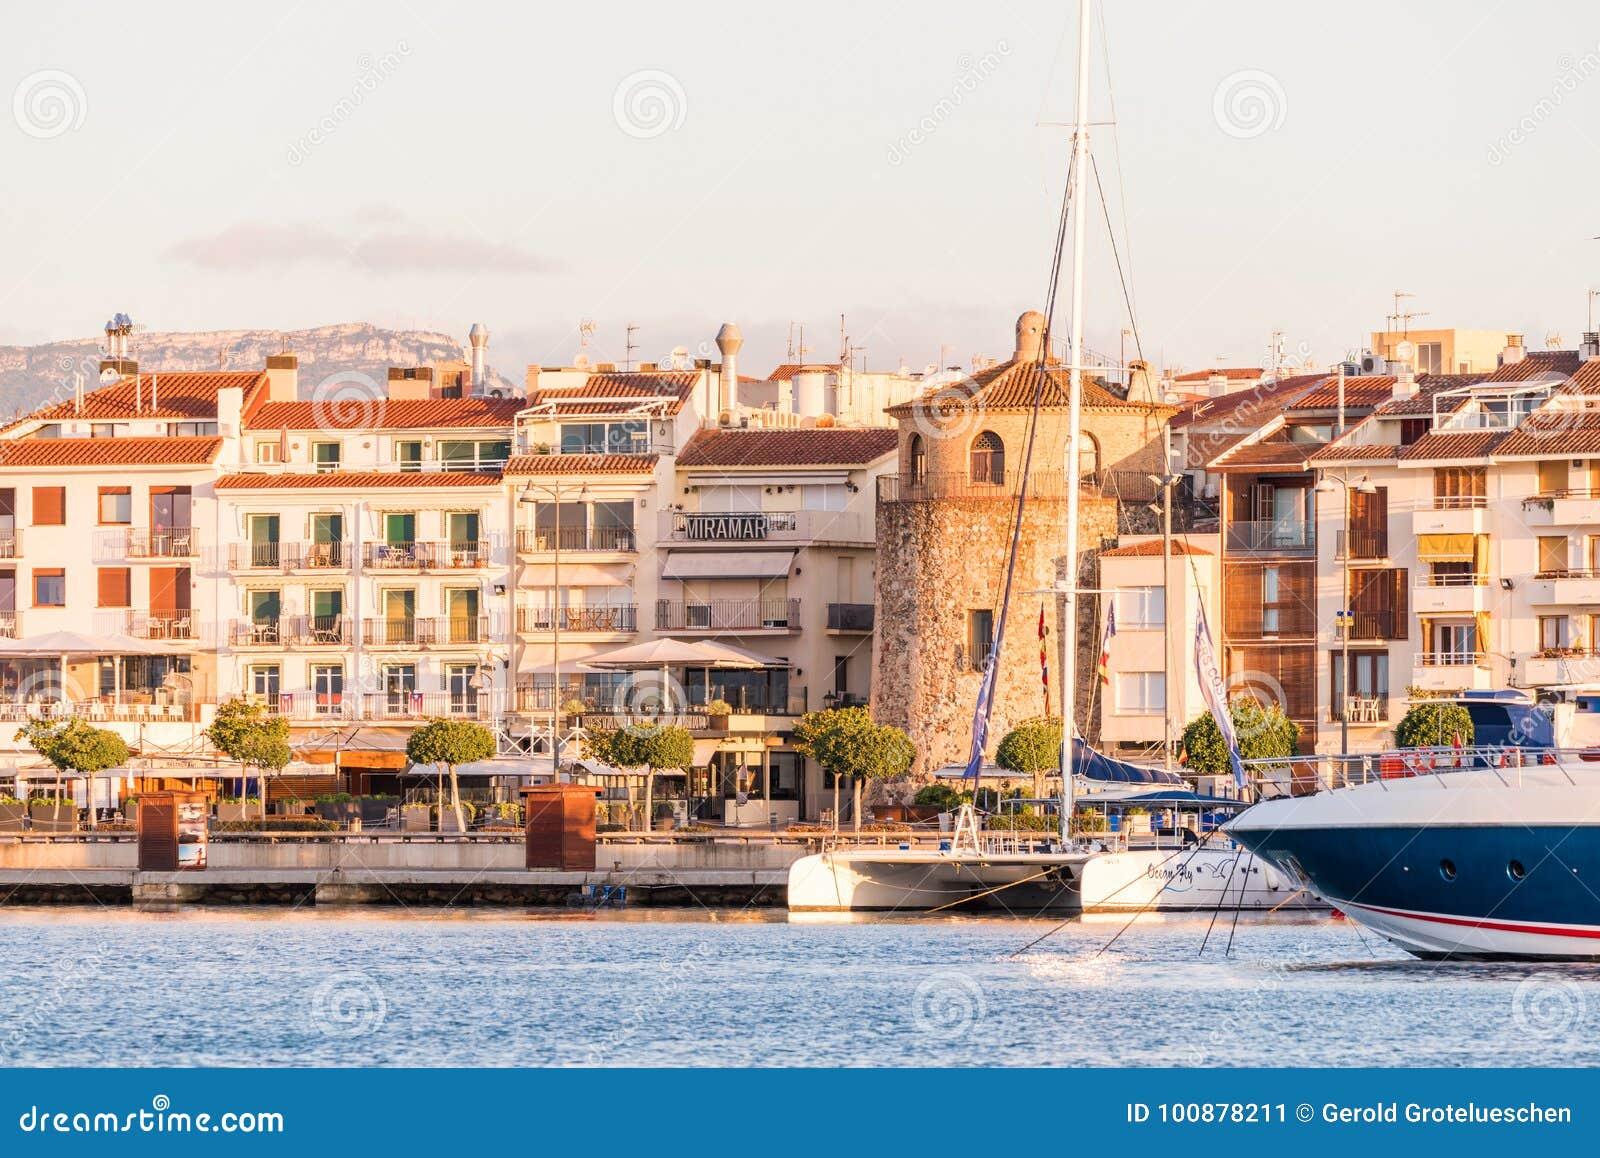 CAMBRILS, SPAIN - SEPTEMBER 16, 2017: View of port and museu d`Hist`ria de Cambrils - Torre del Port. Copy space for text